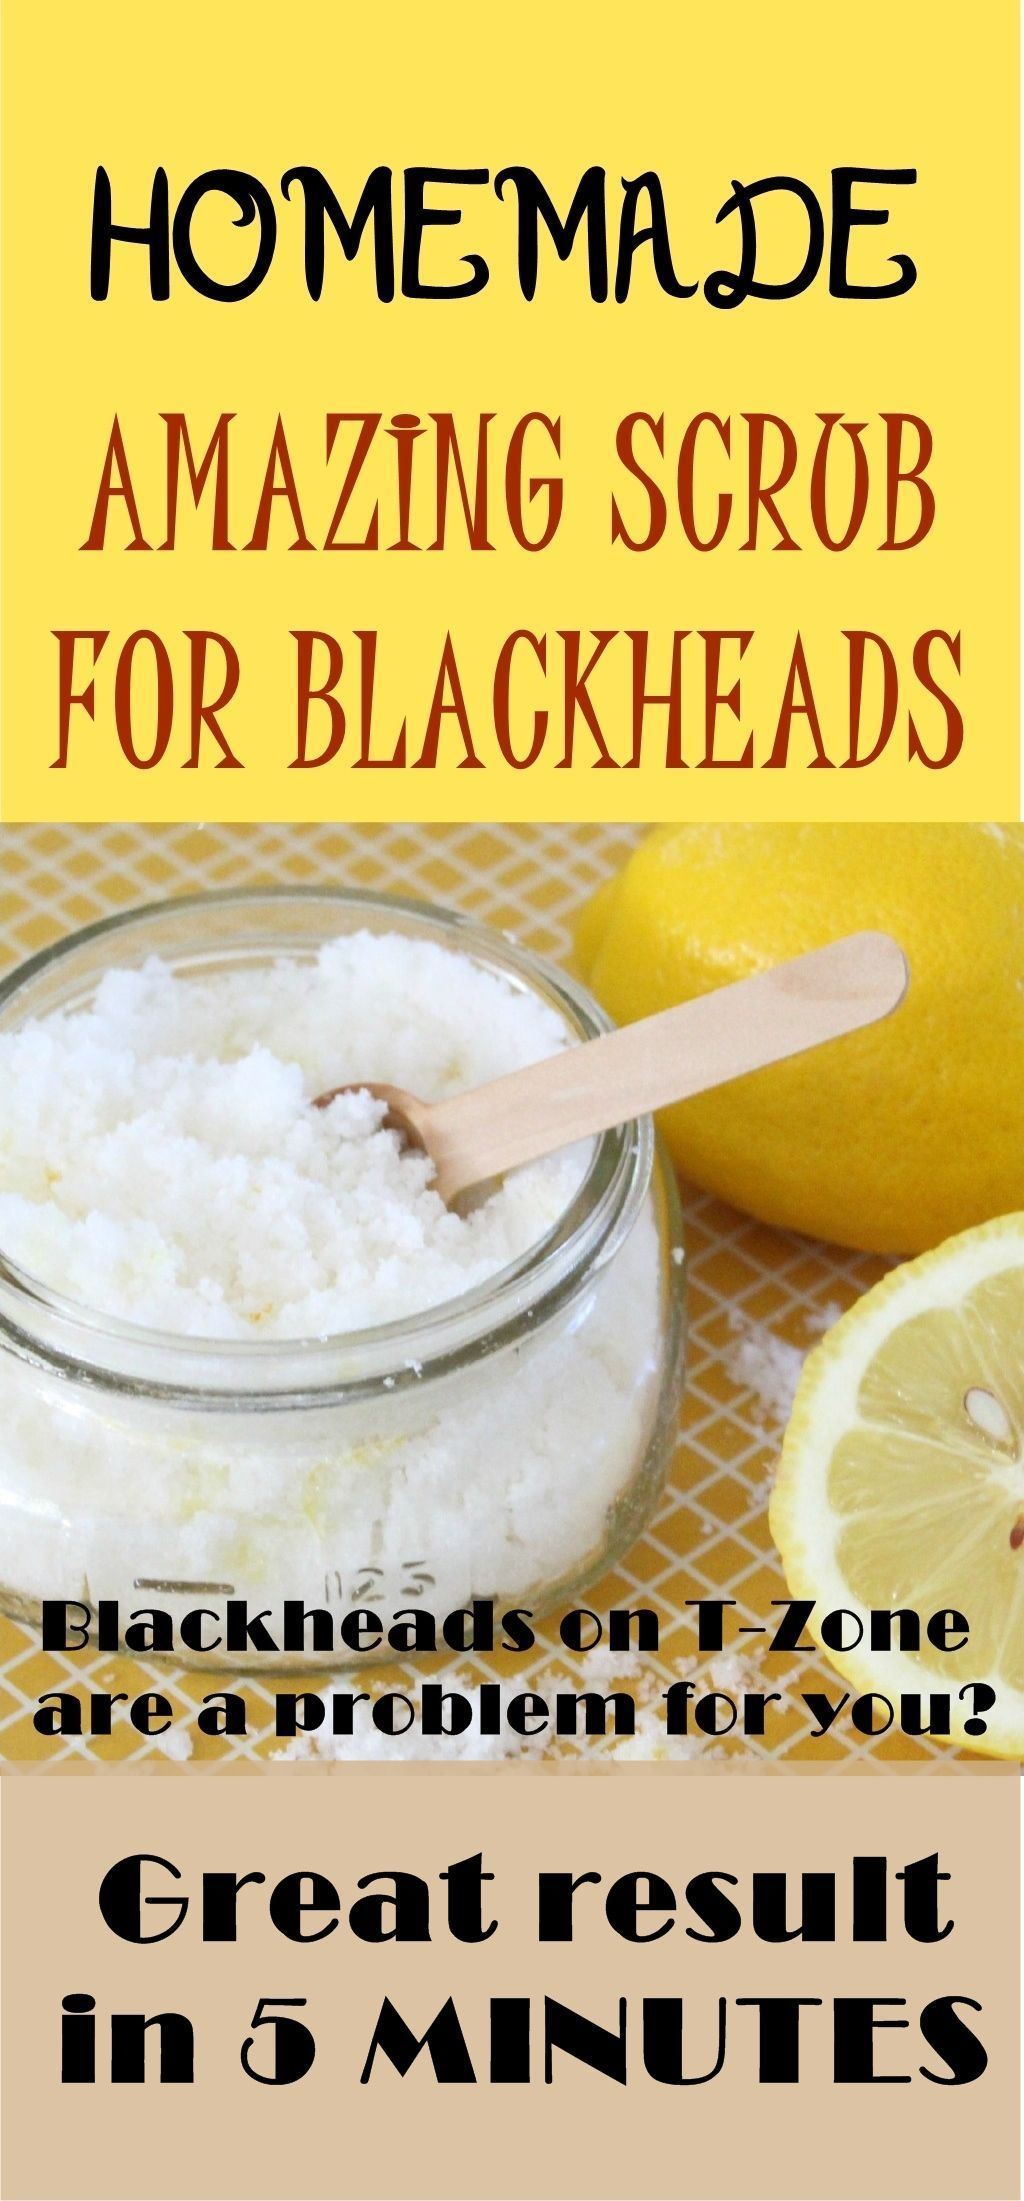 1/2 tsp rice flour with + 56 drops of fresh lemon juice